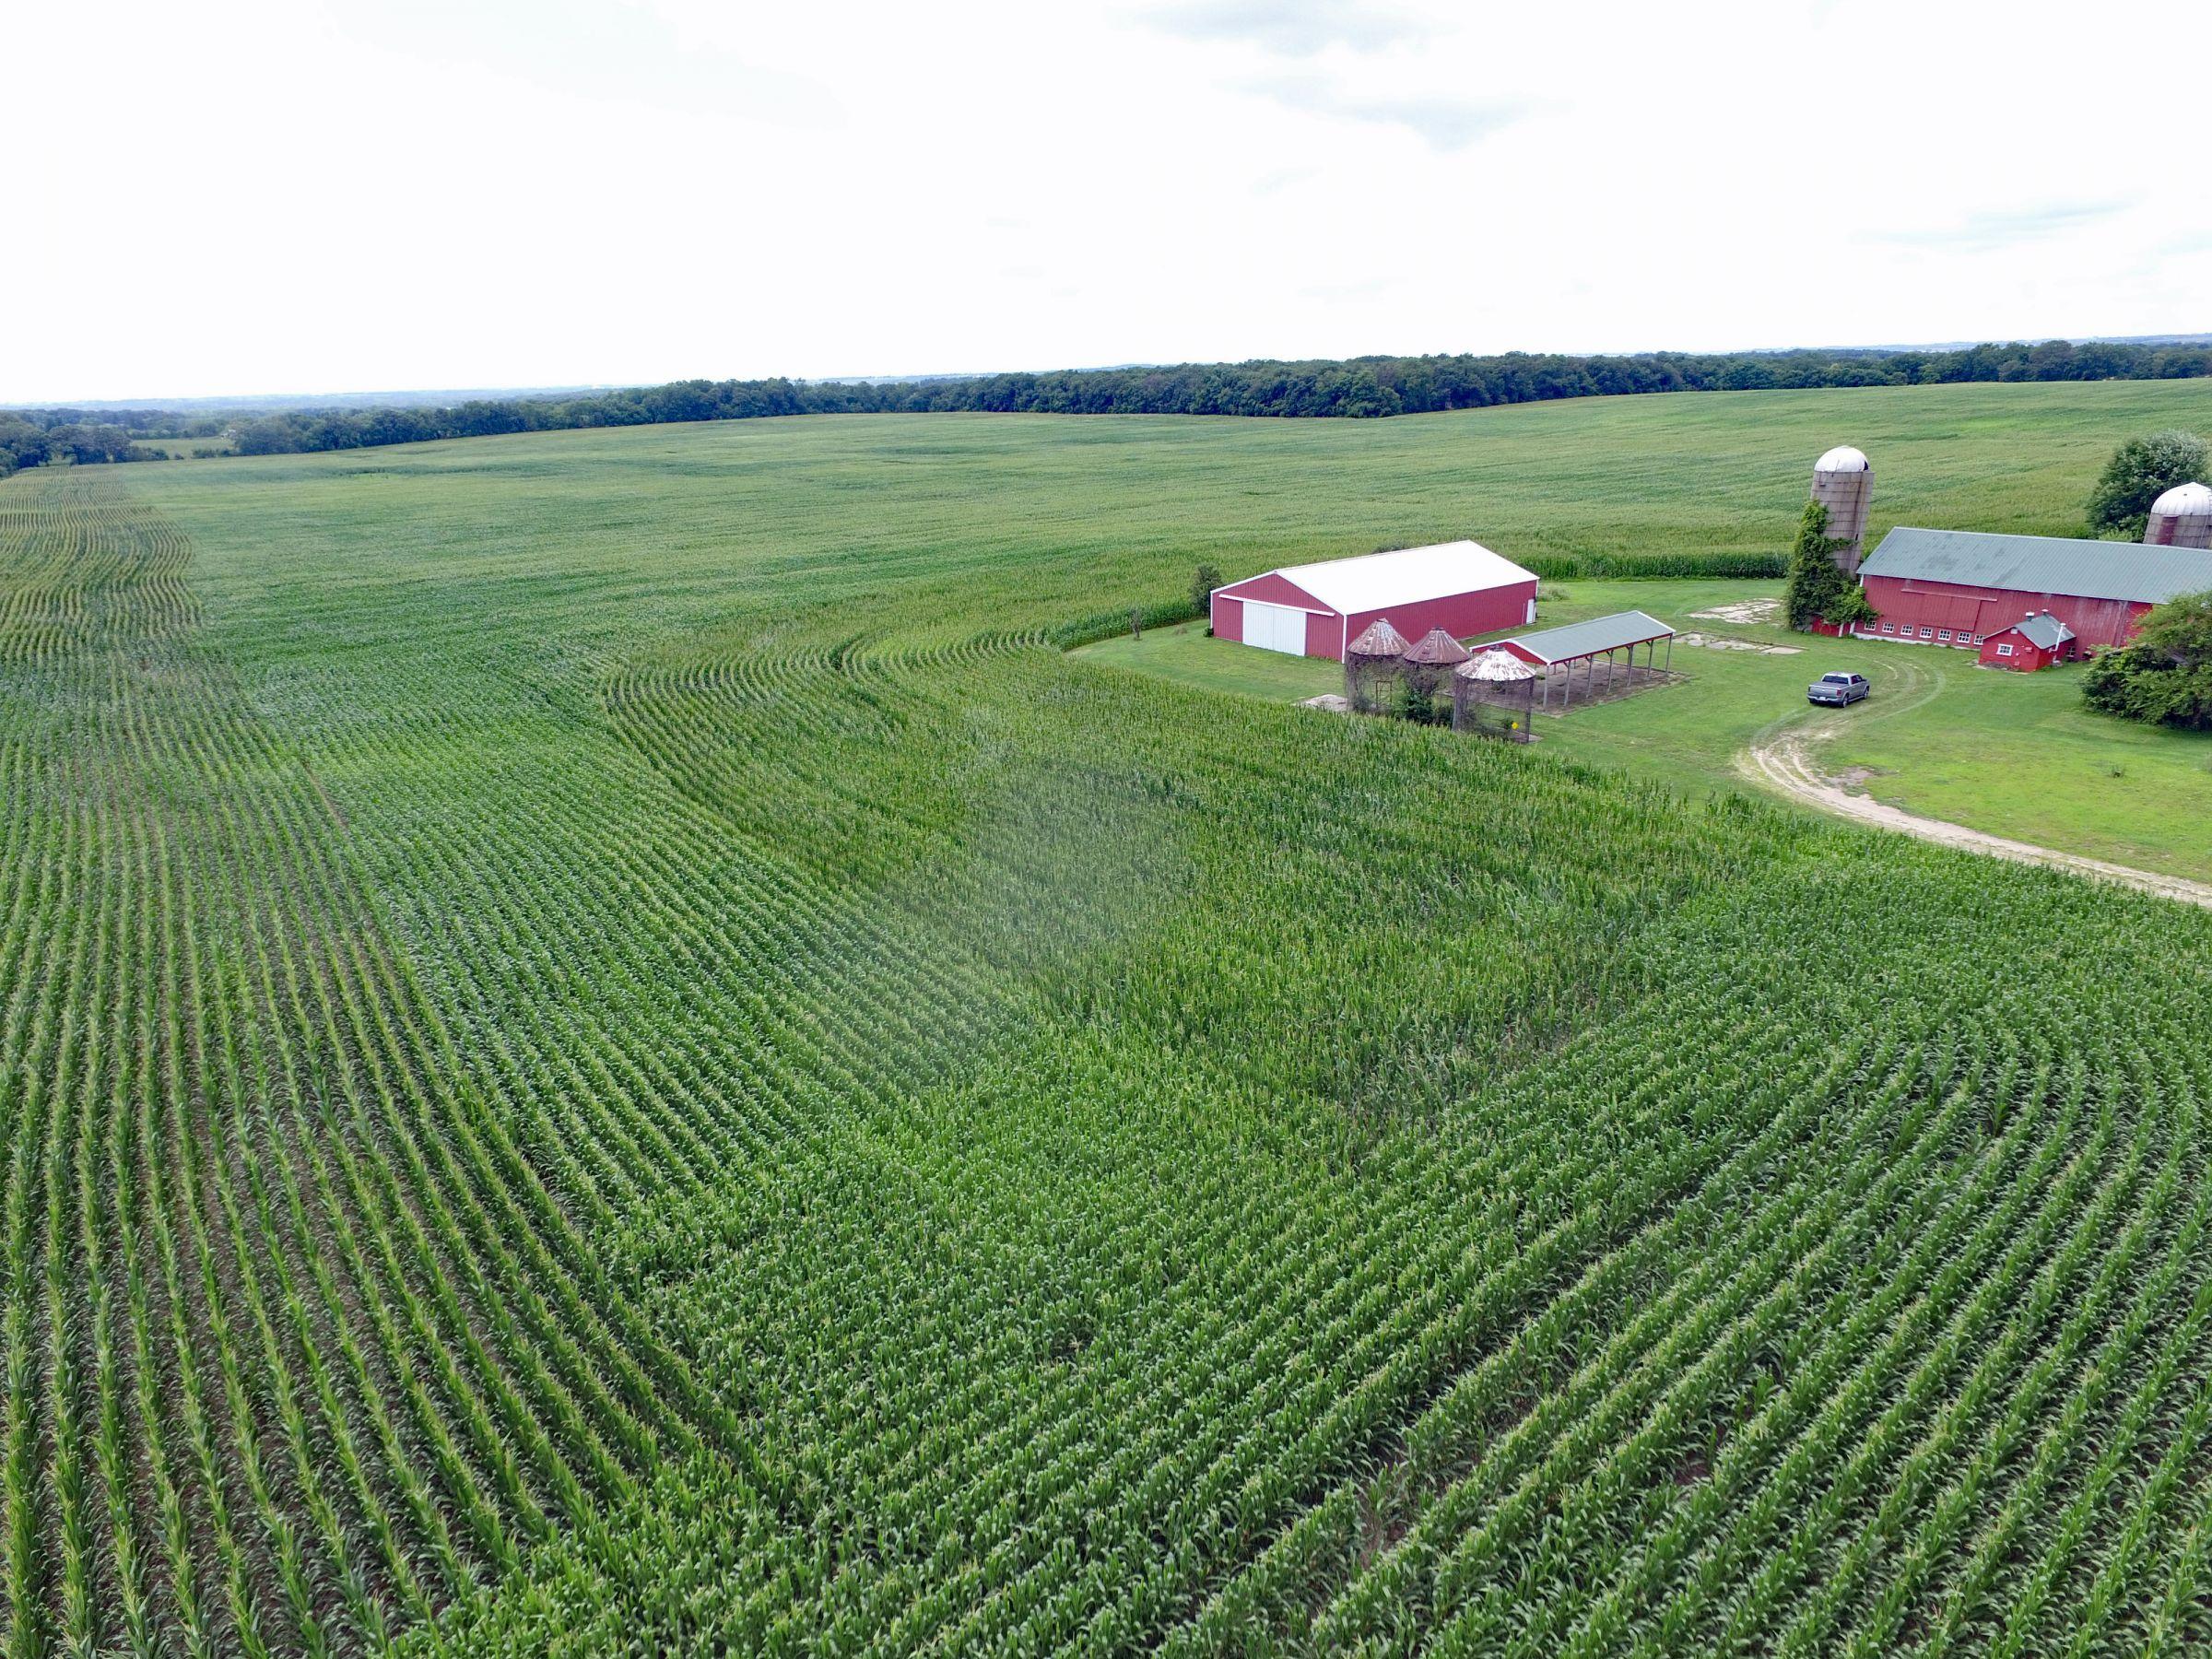 land-winnebago-county-illinois-127-acres-listing-number-15094-1-2020-08-03-160422.jpg